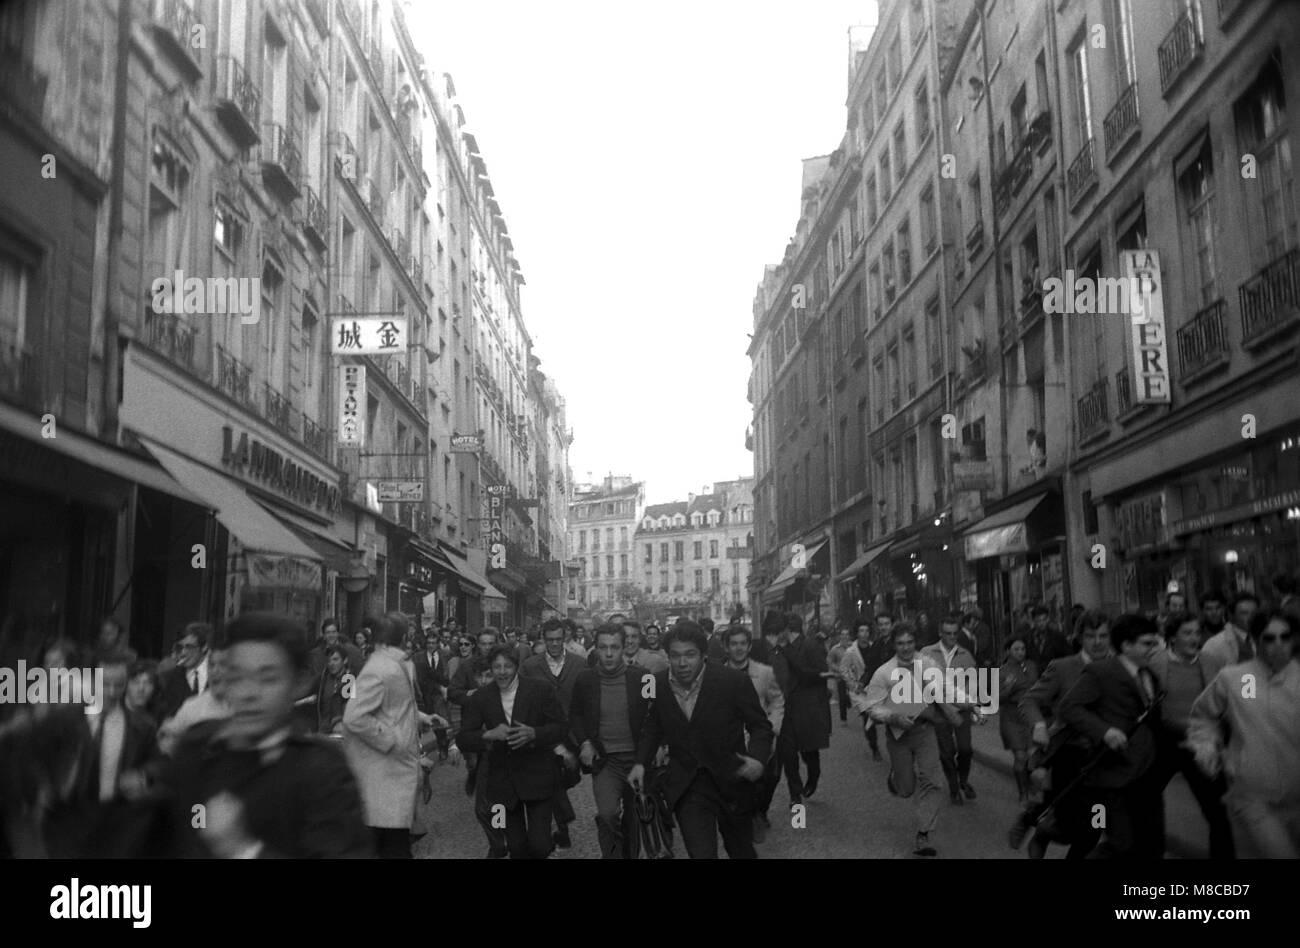 Philippe Gras / Le Pictorium -  May 68 -  1968  -  France / Ile-de-France (region) / Paris  -  Protesters flee from - Stock Image